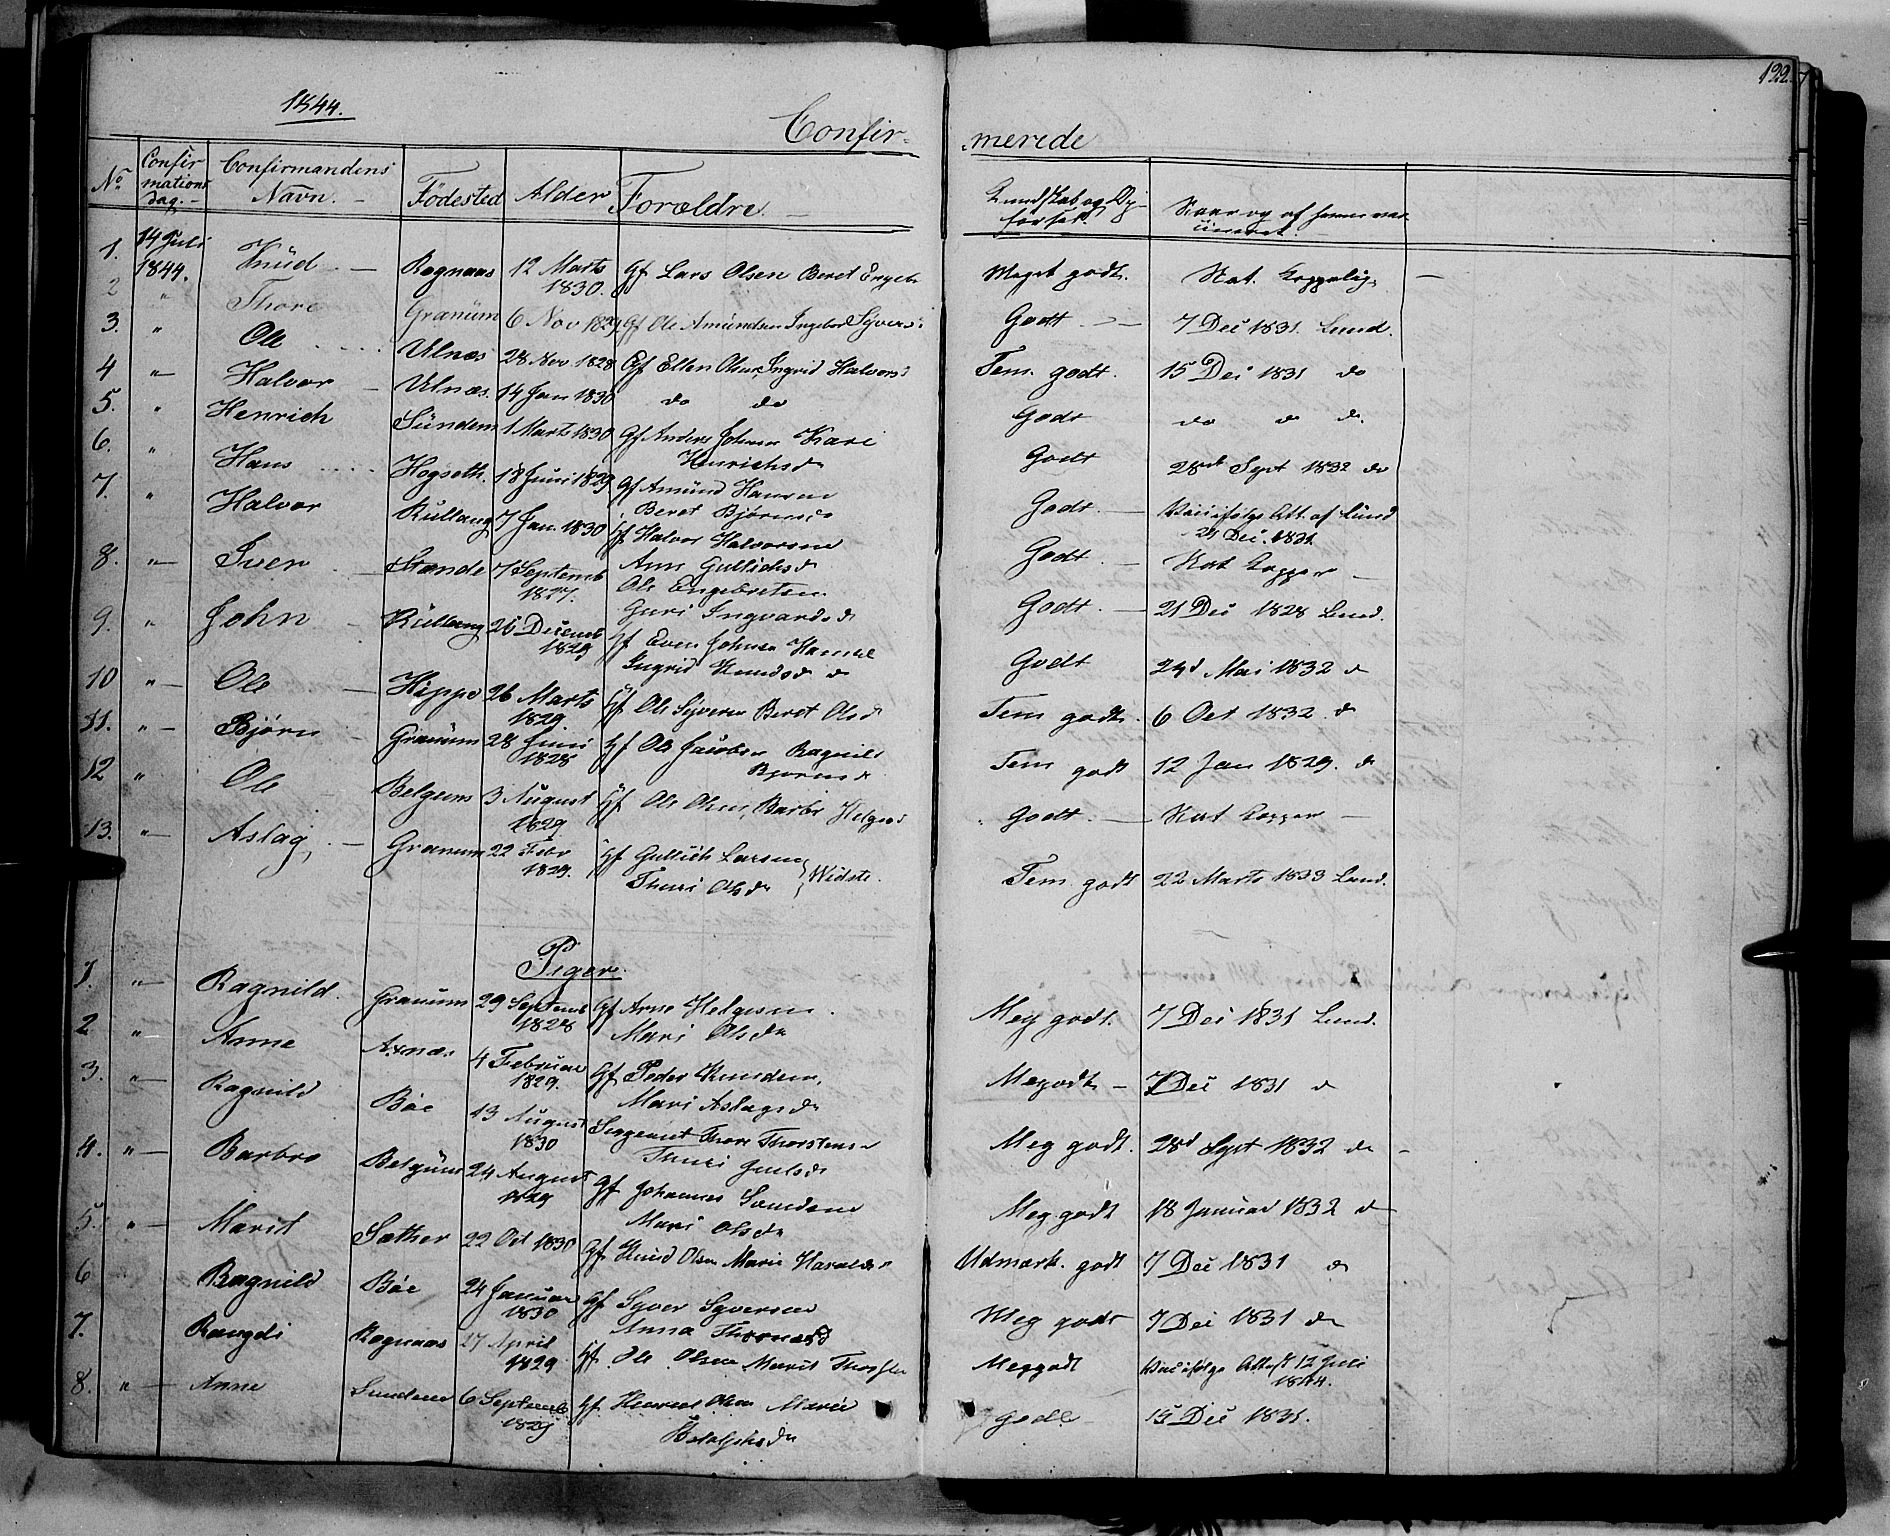 SAH, Nord-Aurdal prestekontor, Ministerialbok nr. 6, 1842-1863, s. 122